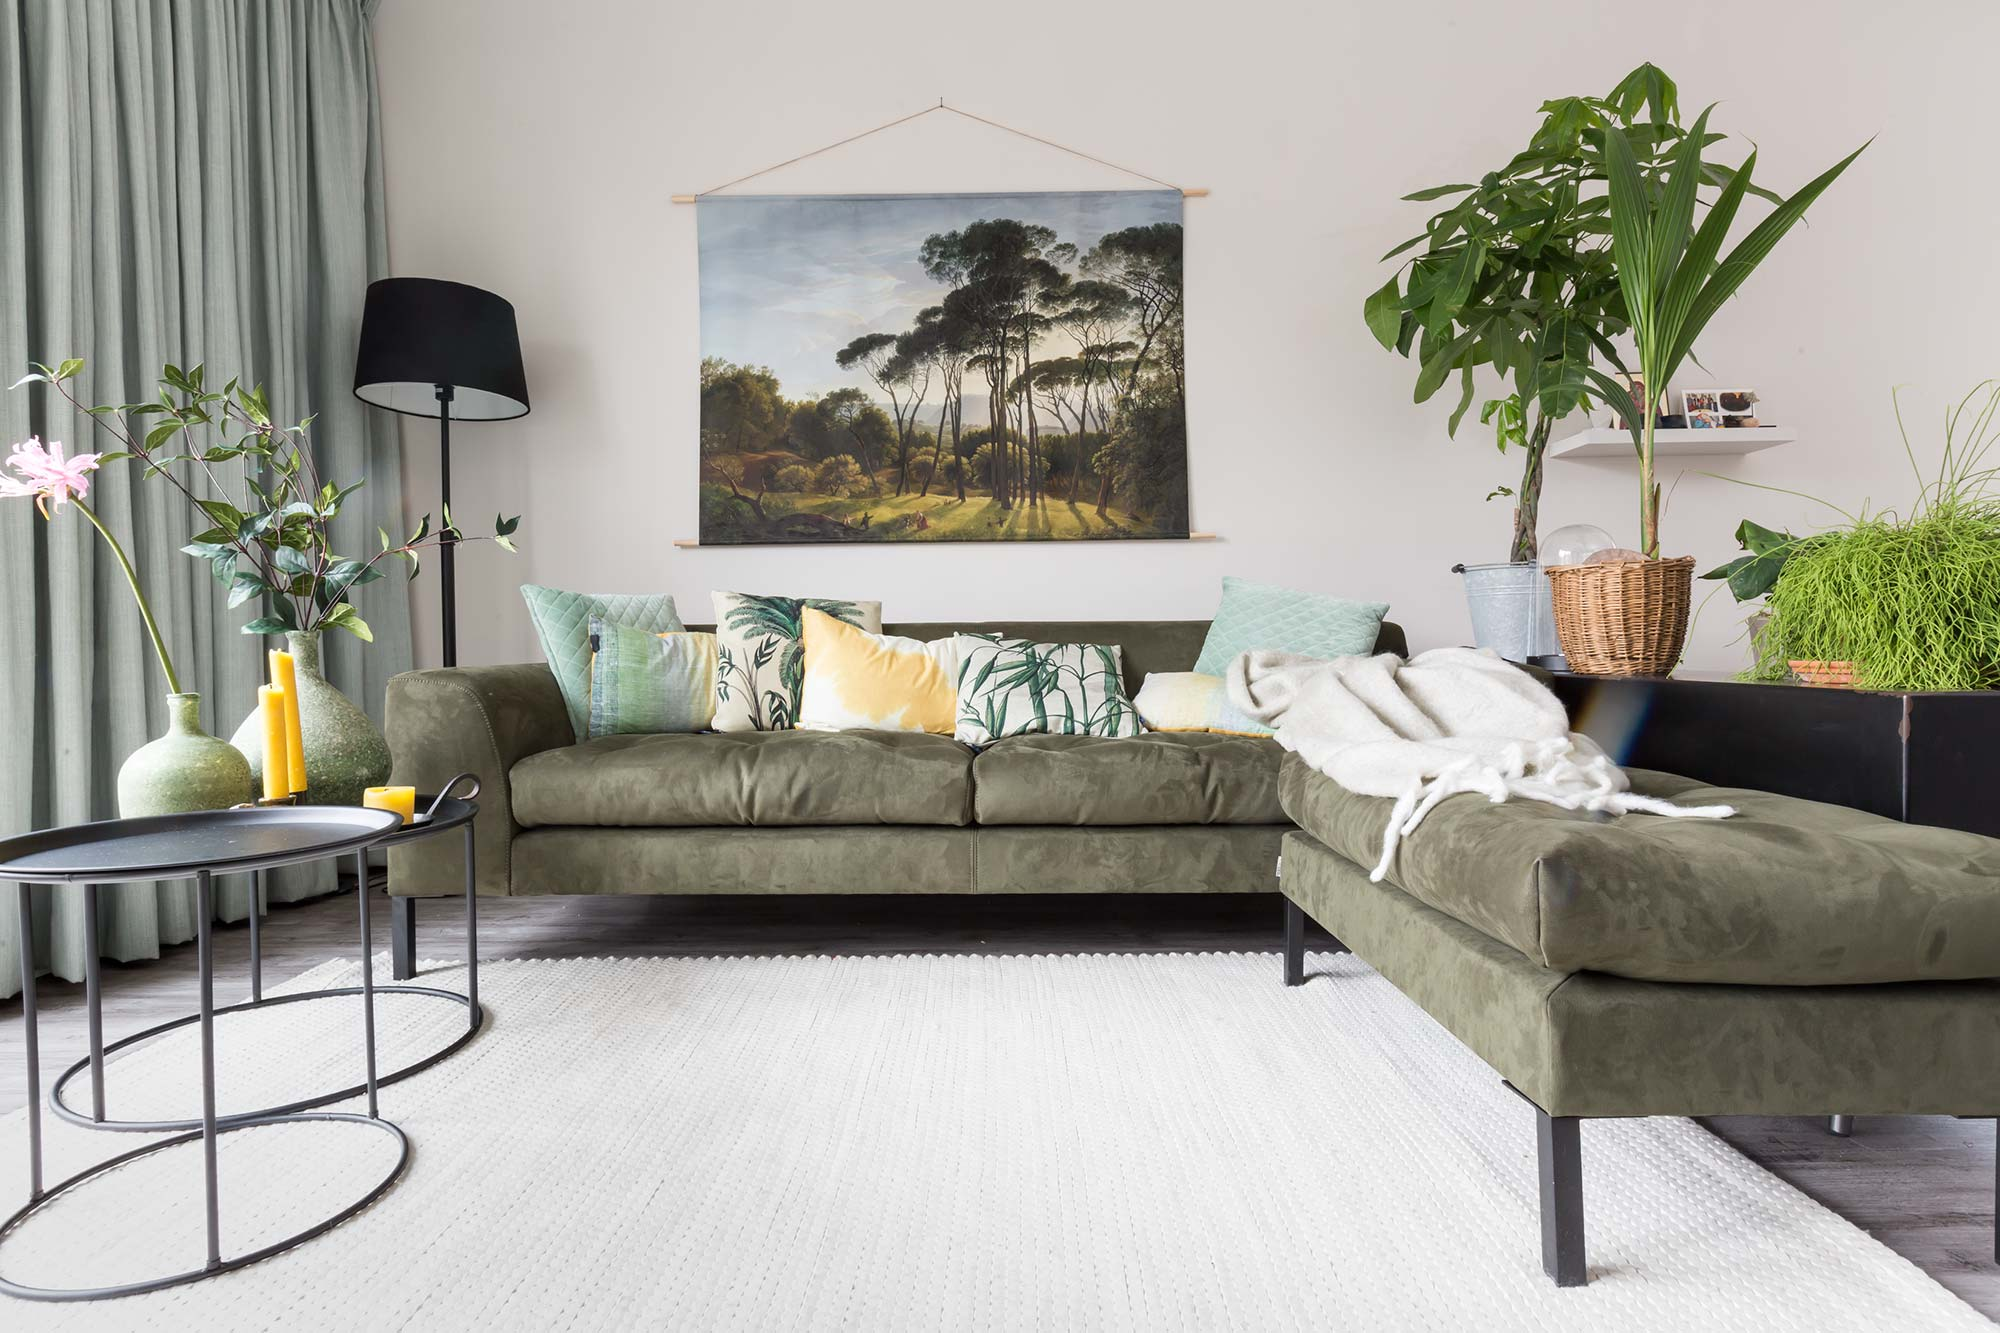 Groene zithoek met loungebank